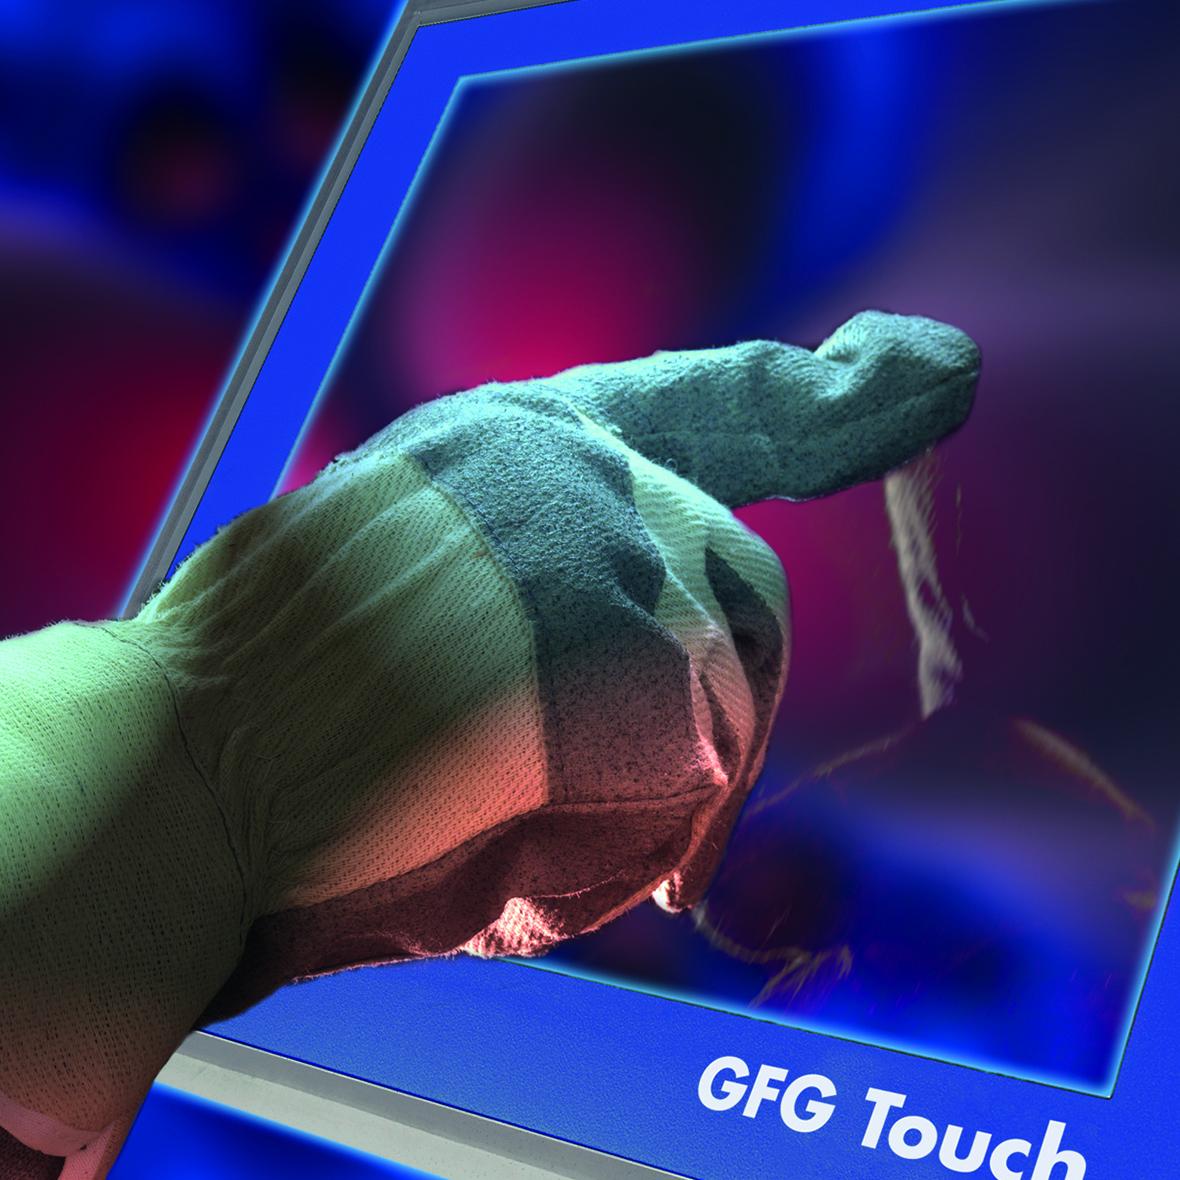 SCHURTER_Resistive_Touch